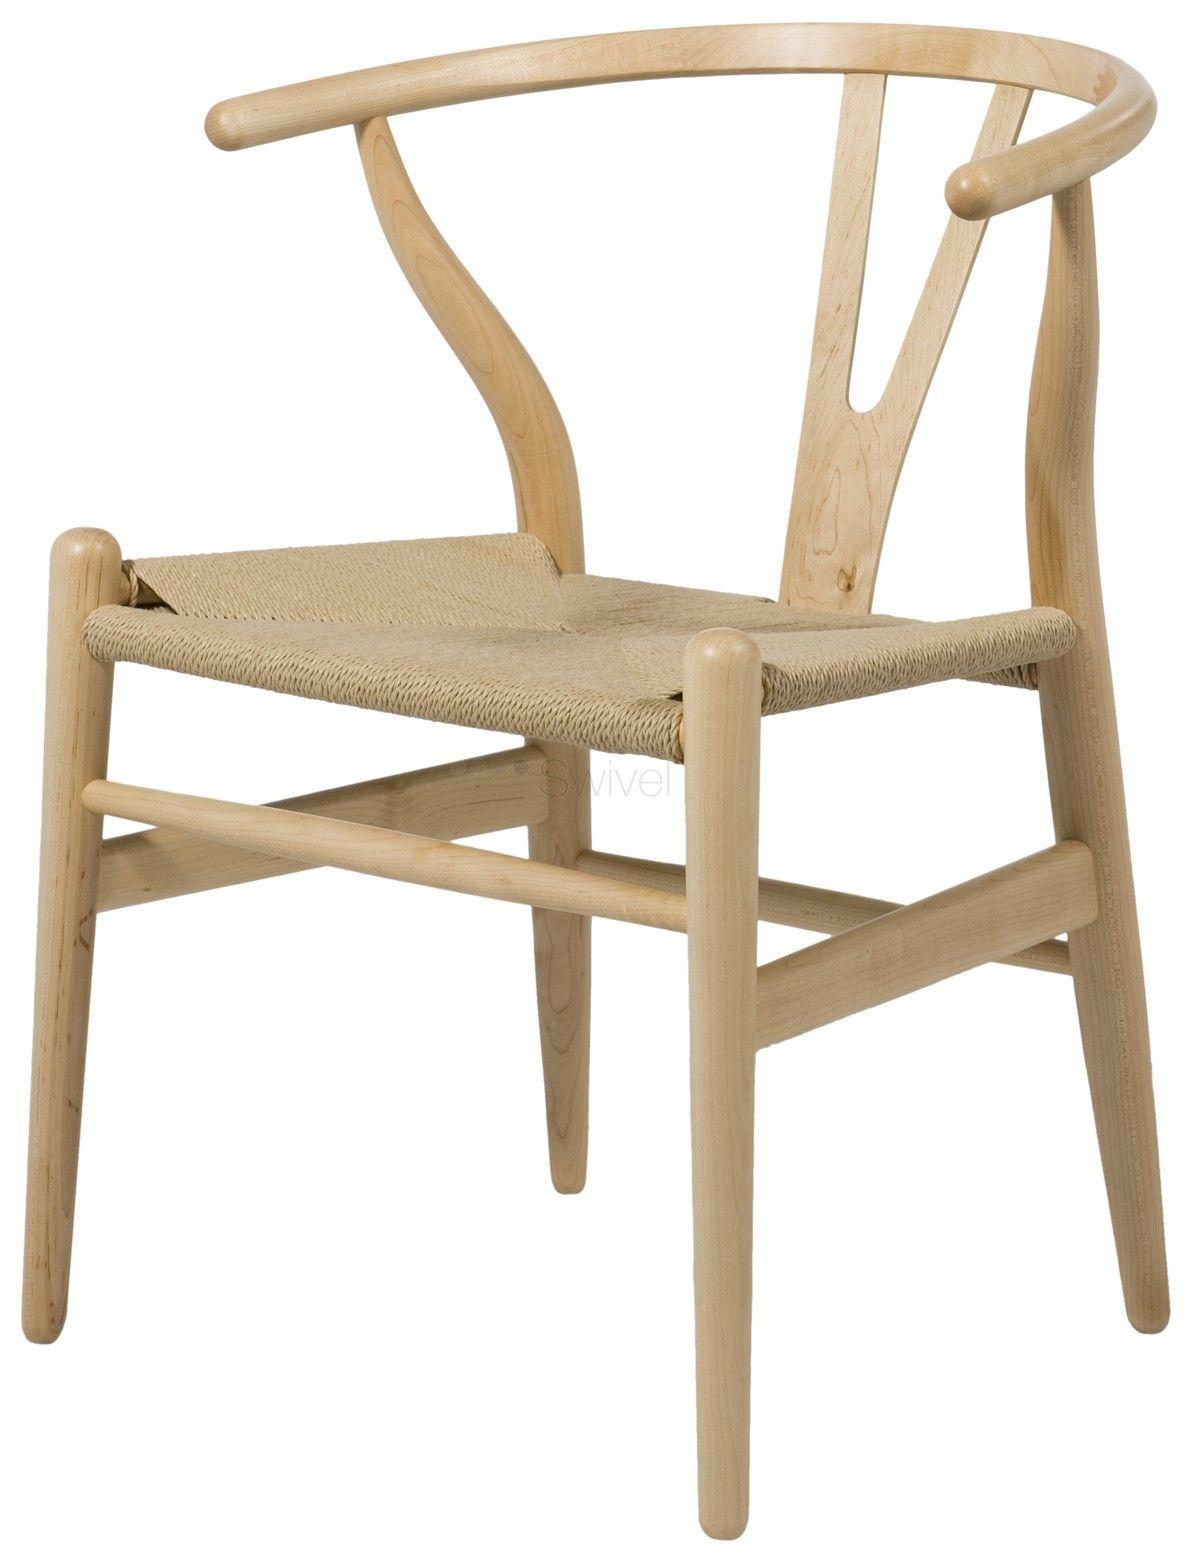 Delightful Hans Wegner Wishbone Chair   Google Search